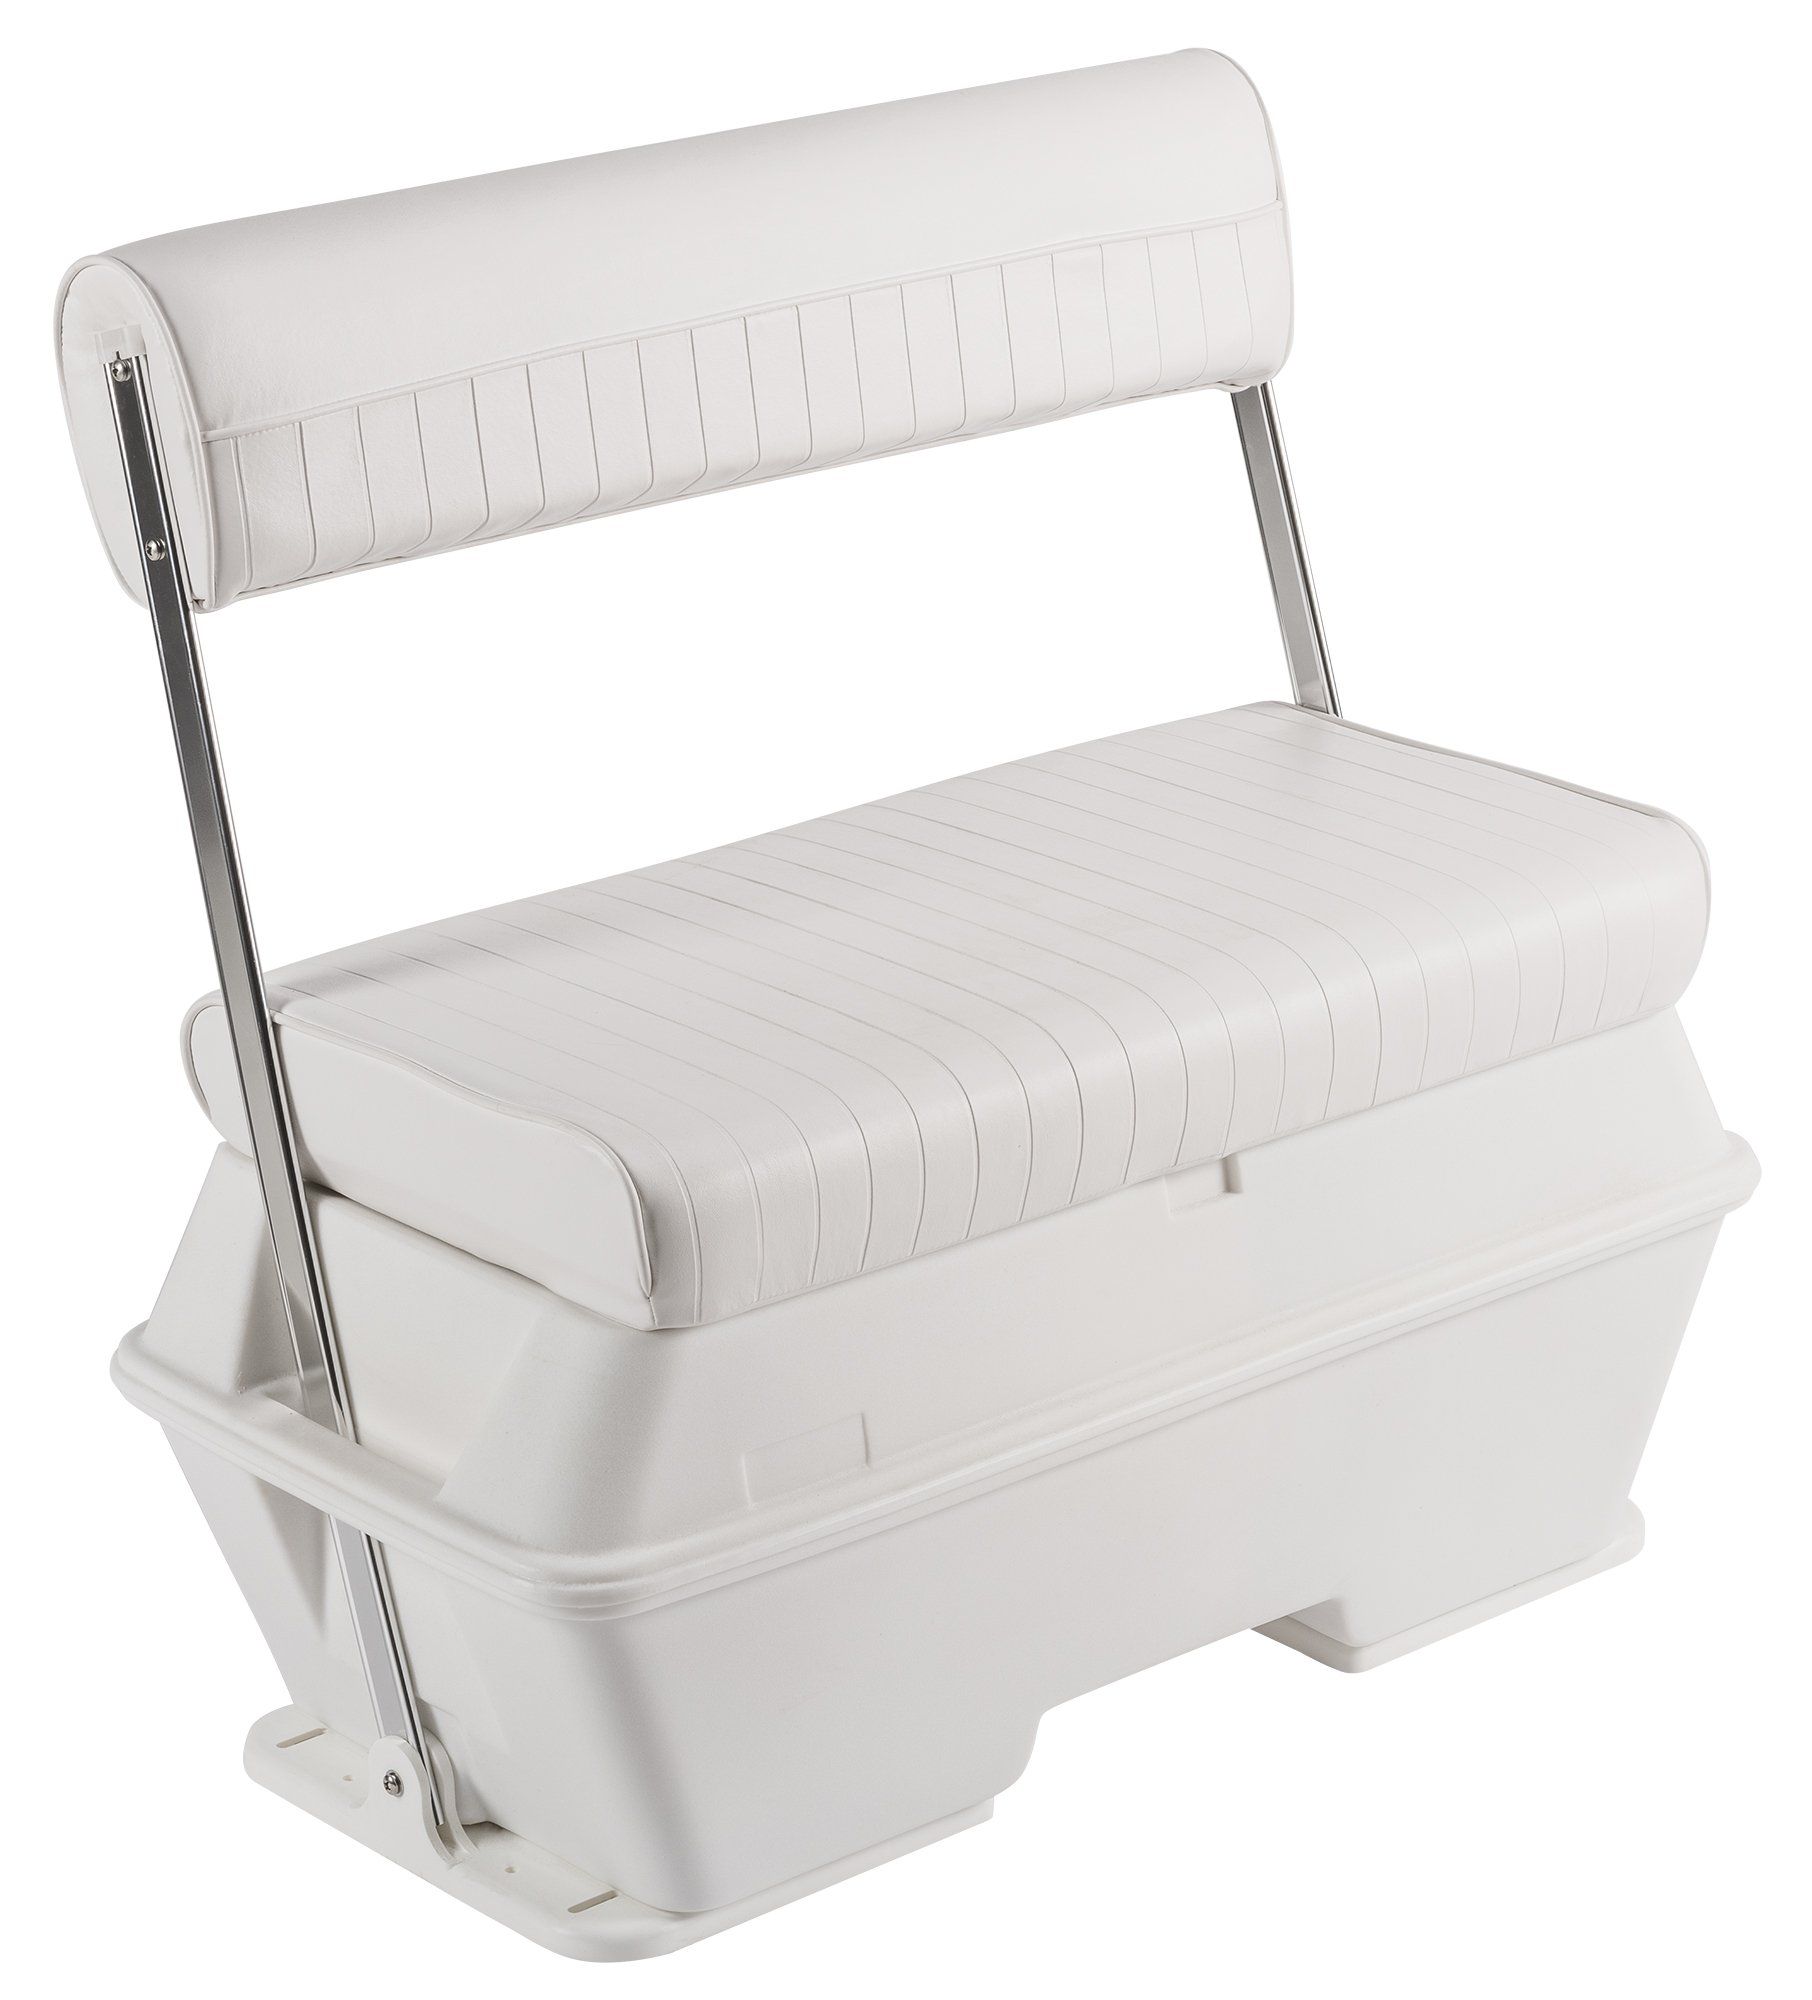 Wise 8WD156-784 Swingback Cooler Seat, 70-Quart, Cuddy Brite White